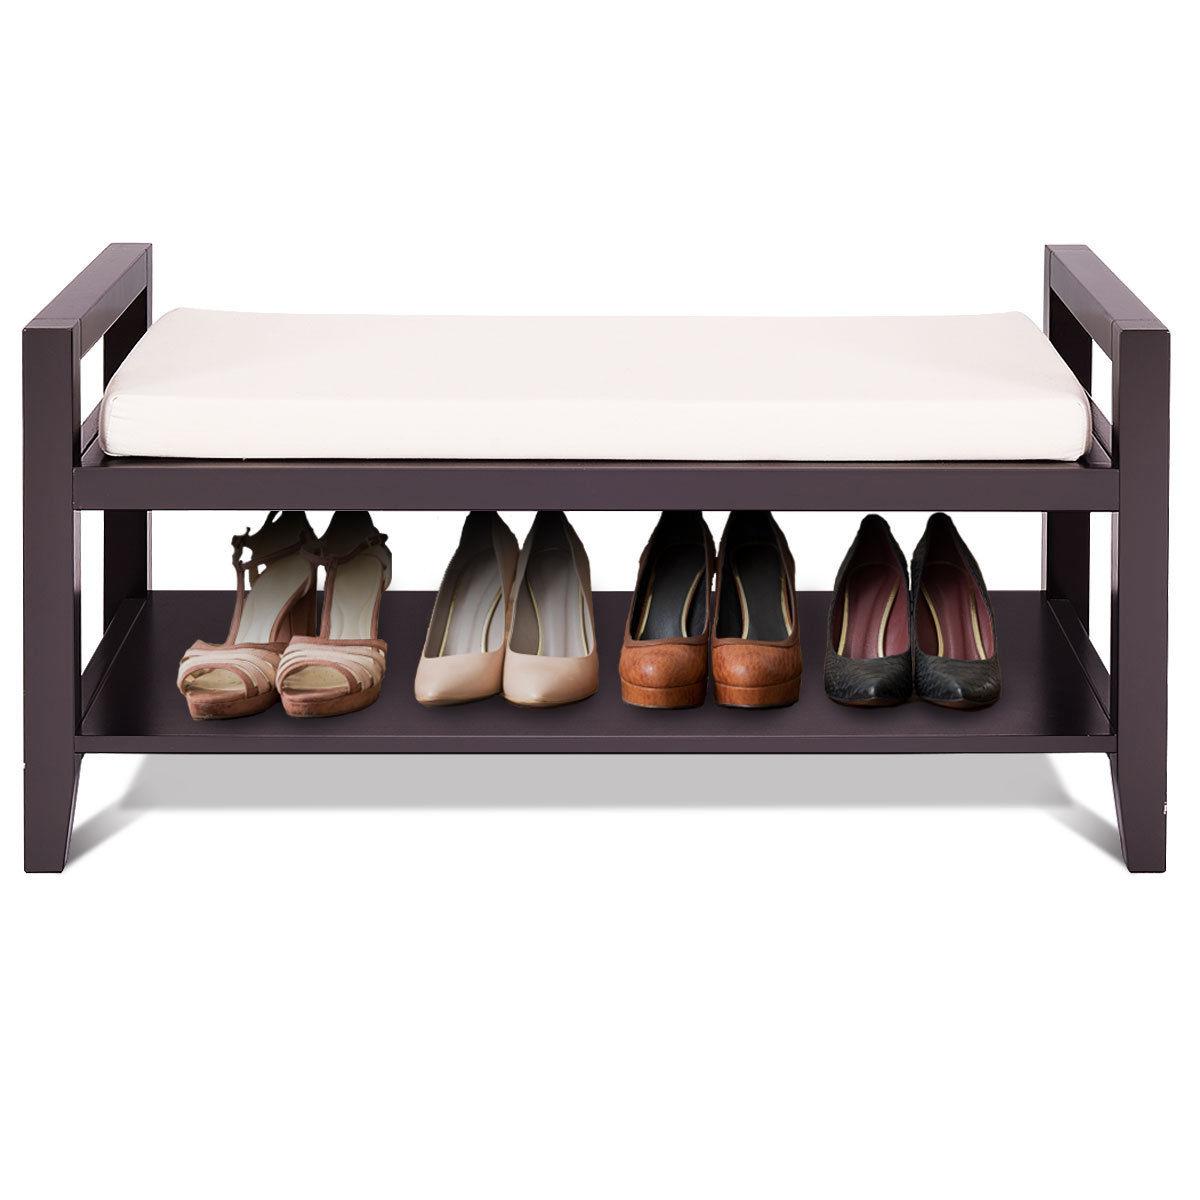 Gymax Wood Shoe Bench Storage Rack Cushion Seat Ottoman Bedroom Hallway Entryway